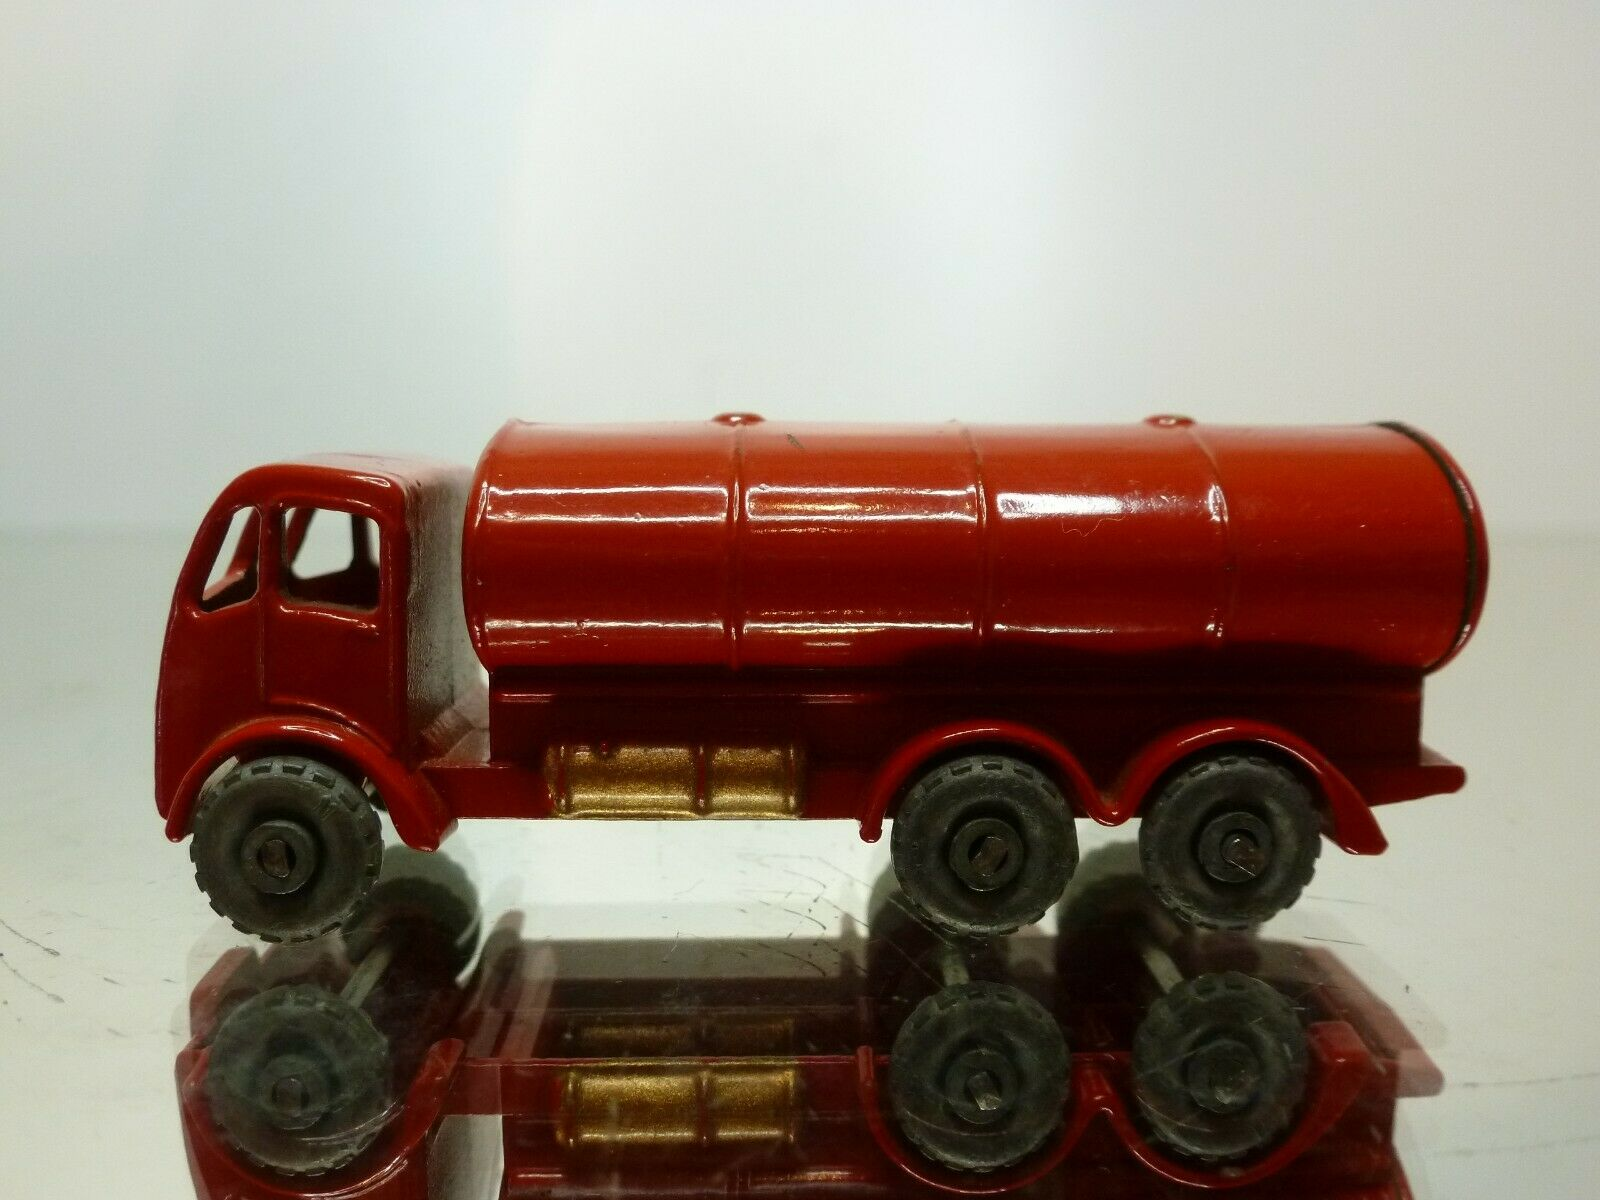 MATCHBOX LESNEY 11 ERF PETROL TANKER - rouge L6.5cm - VERY GOOD CONDITION